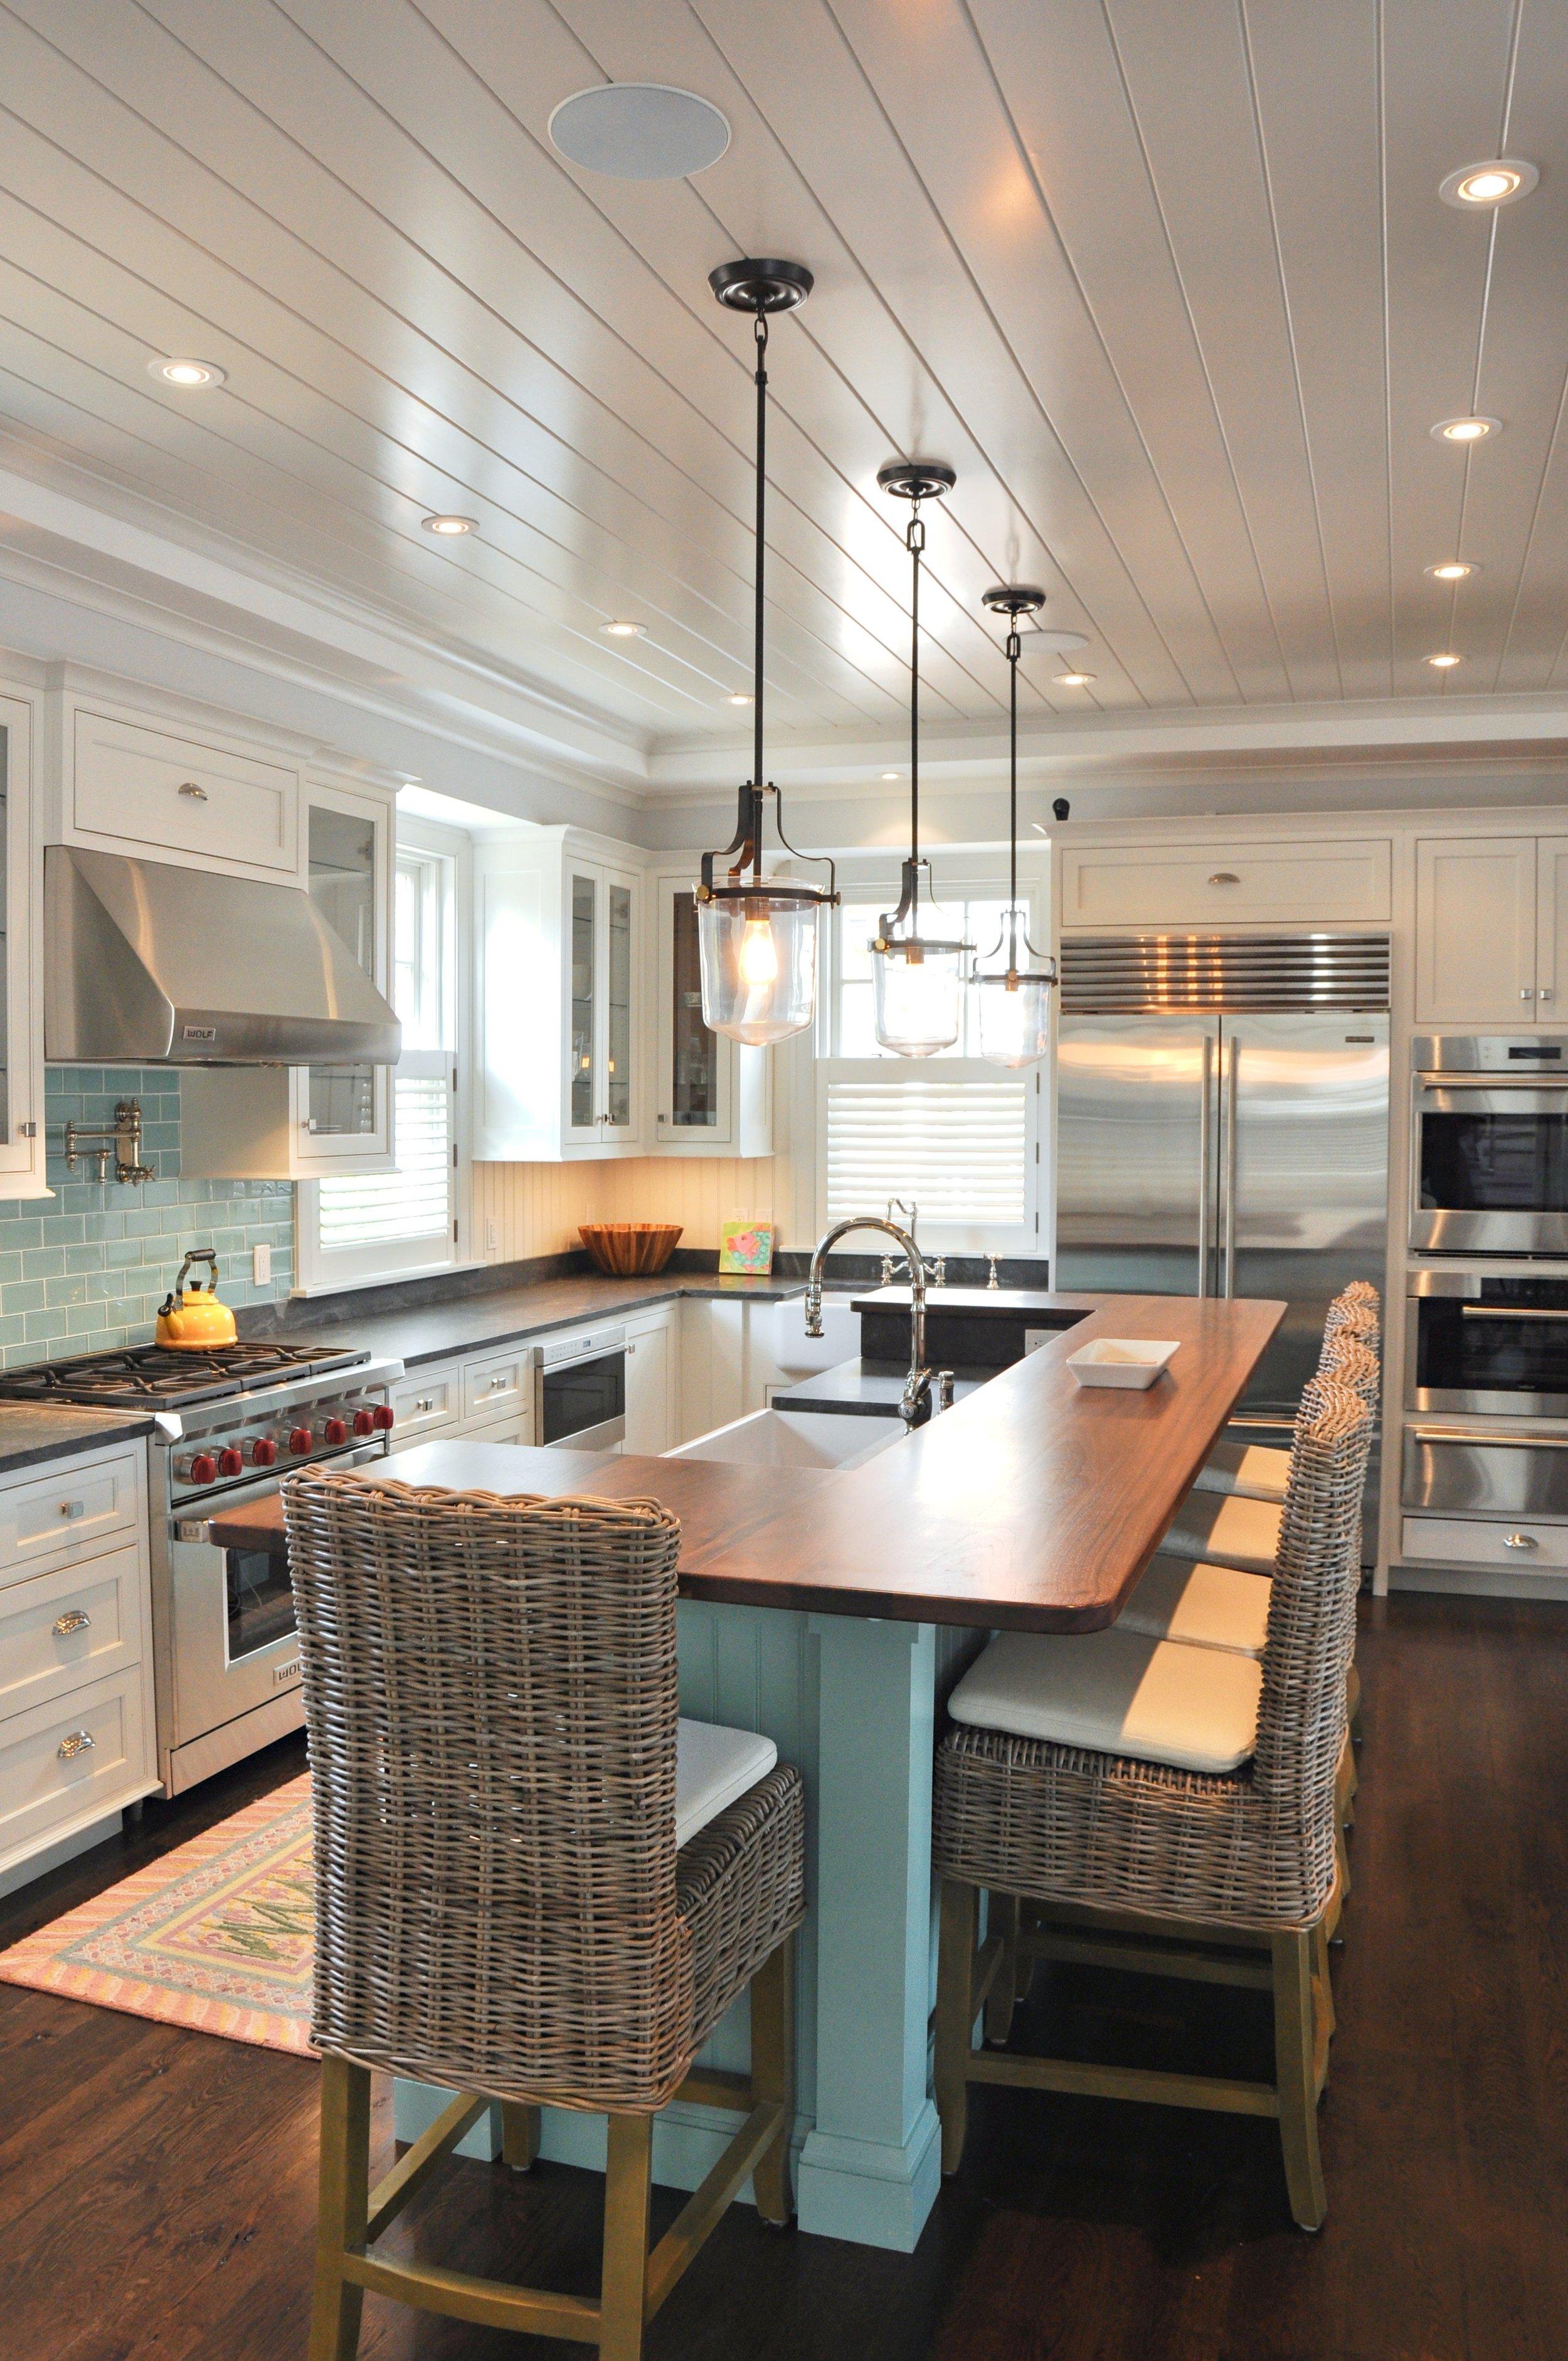 Modern_Turqoise_Teal_Kitchen_Island_Two_Toned_Cabinets.jpg